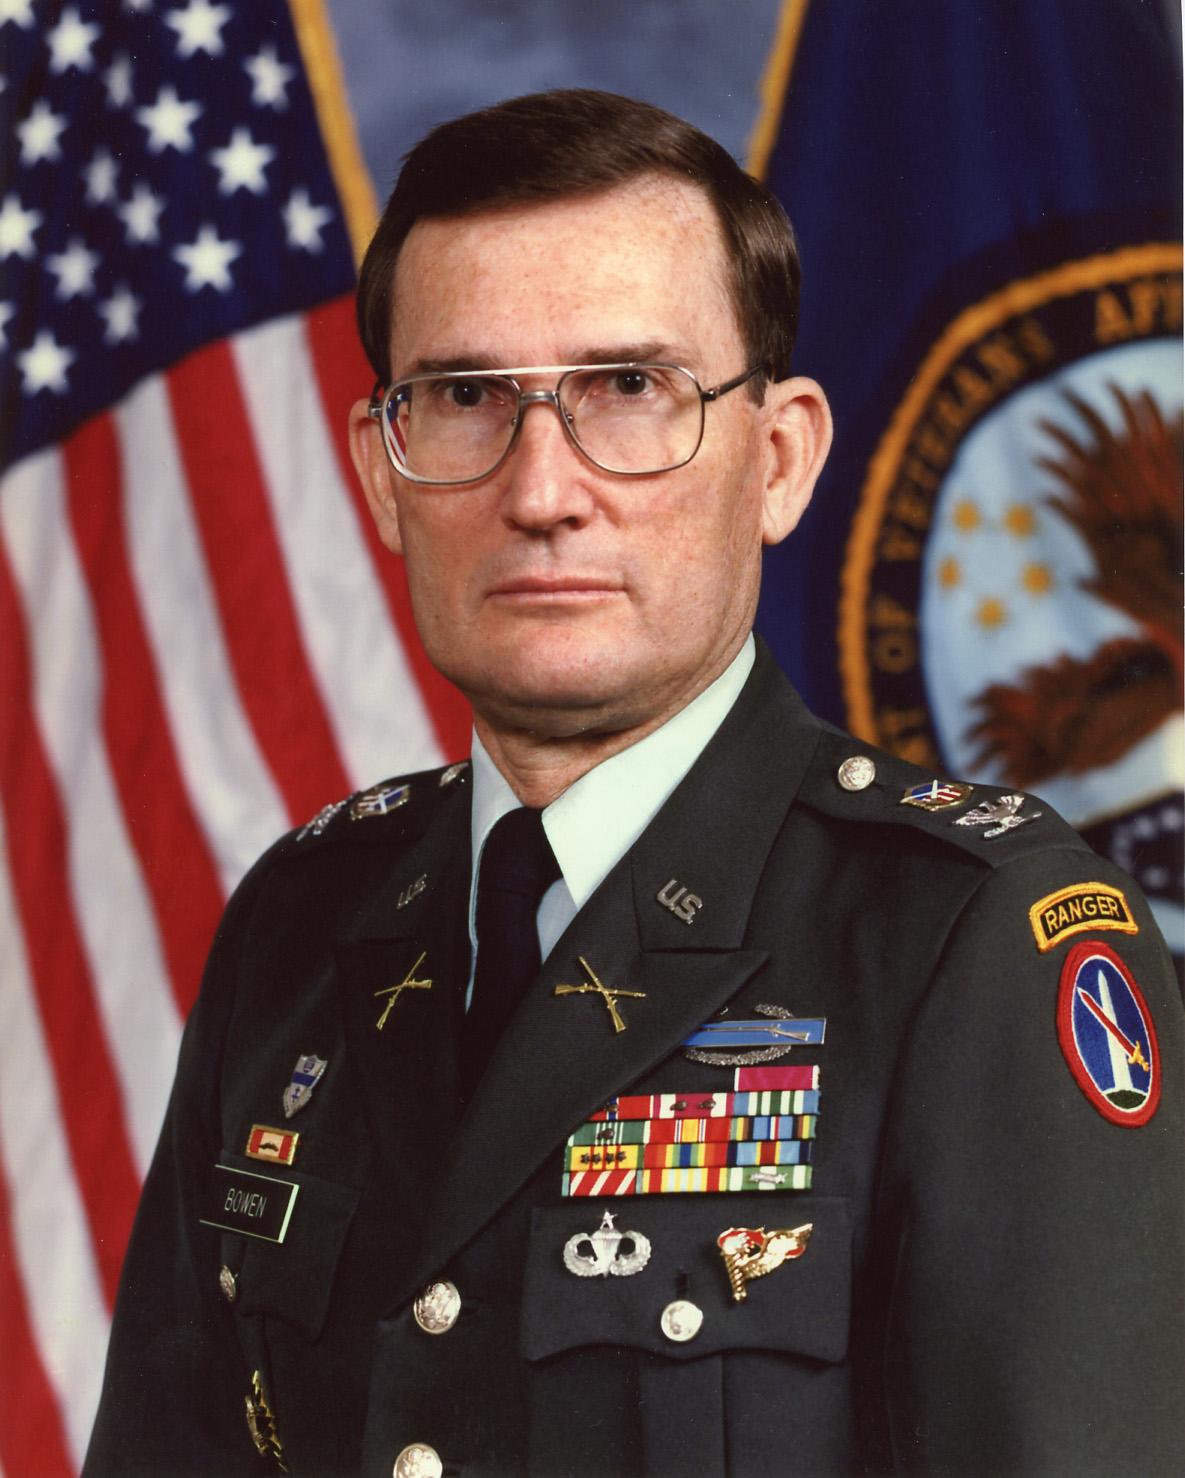 Army ranger dress uniform